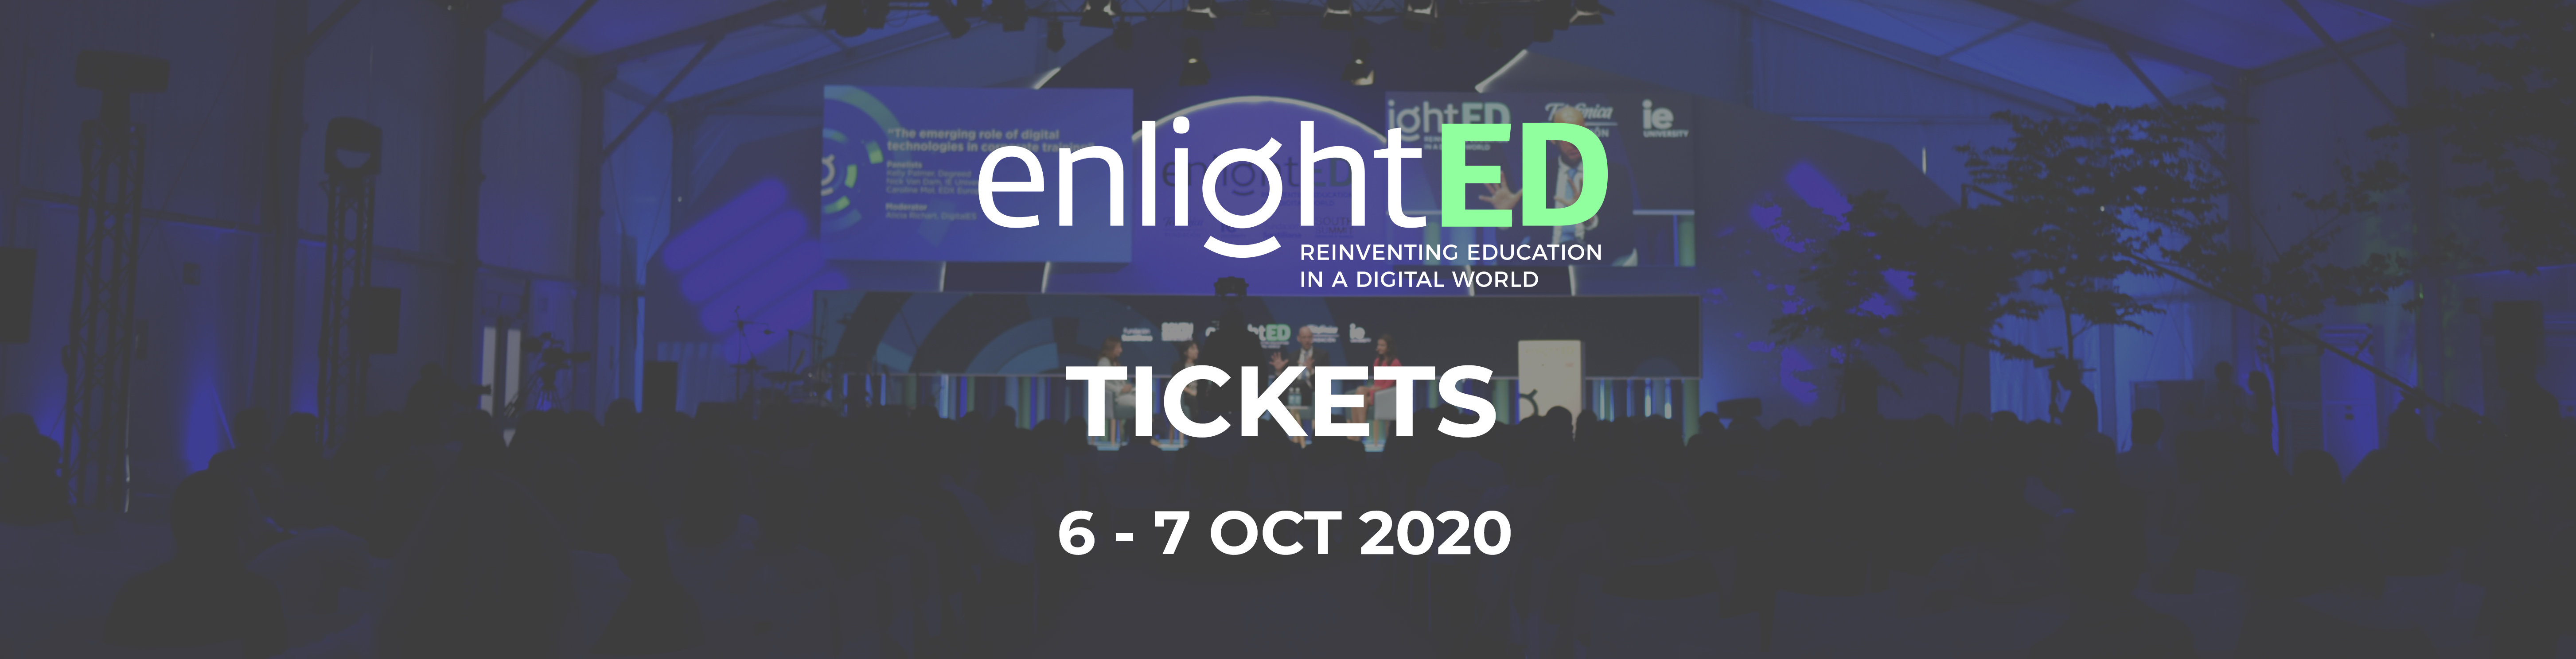 enlightED 2020